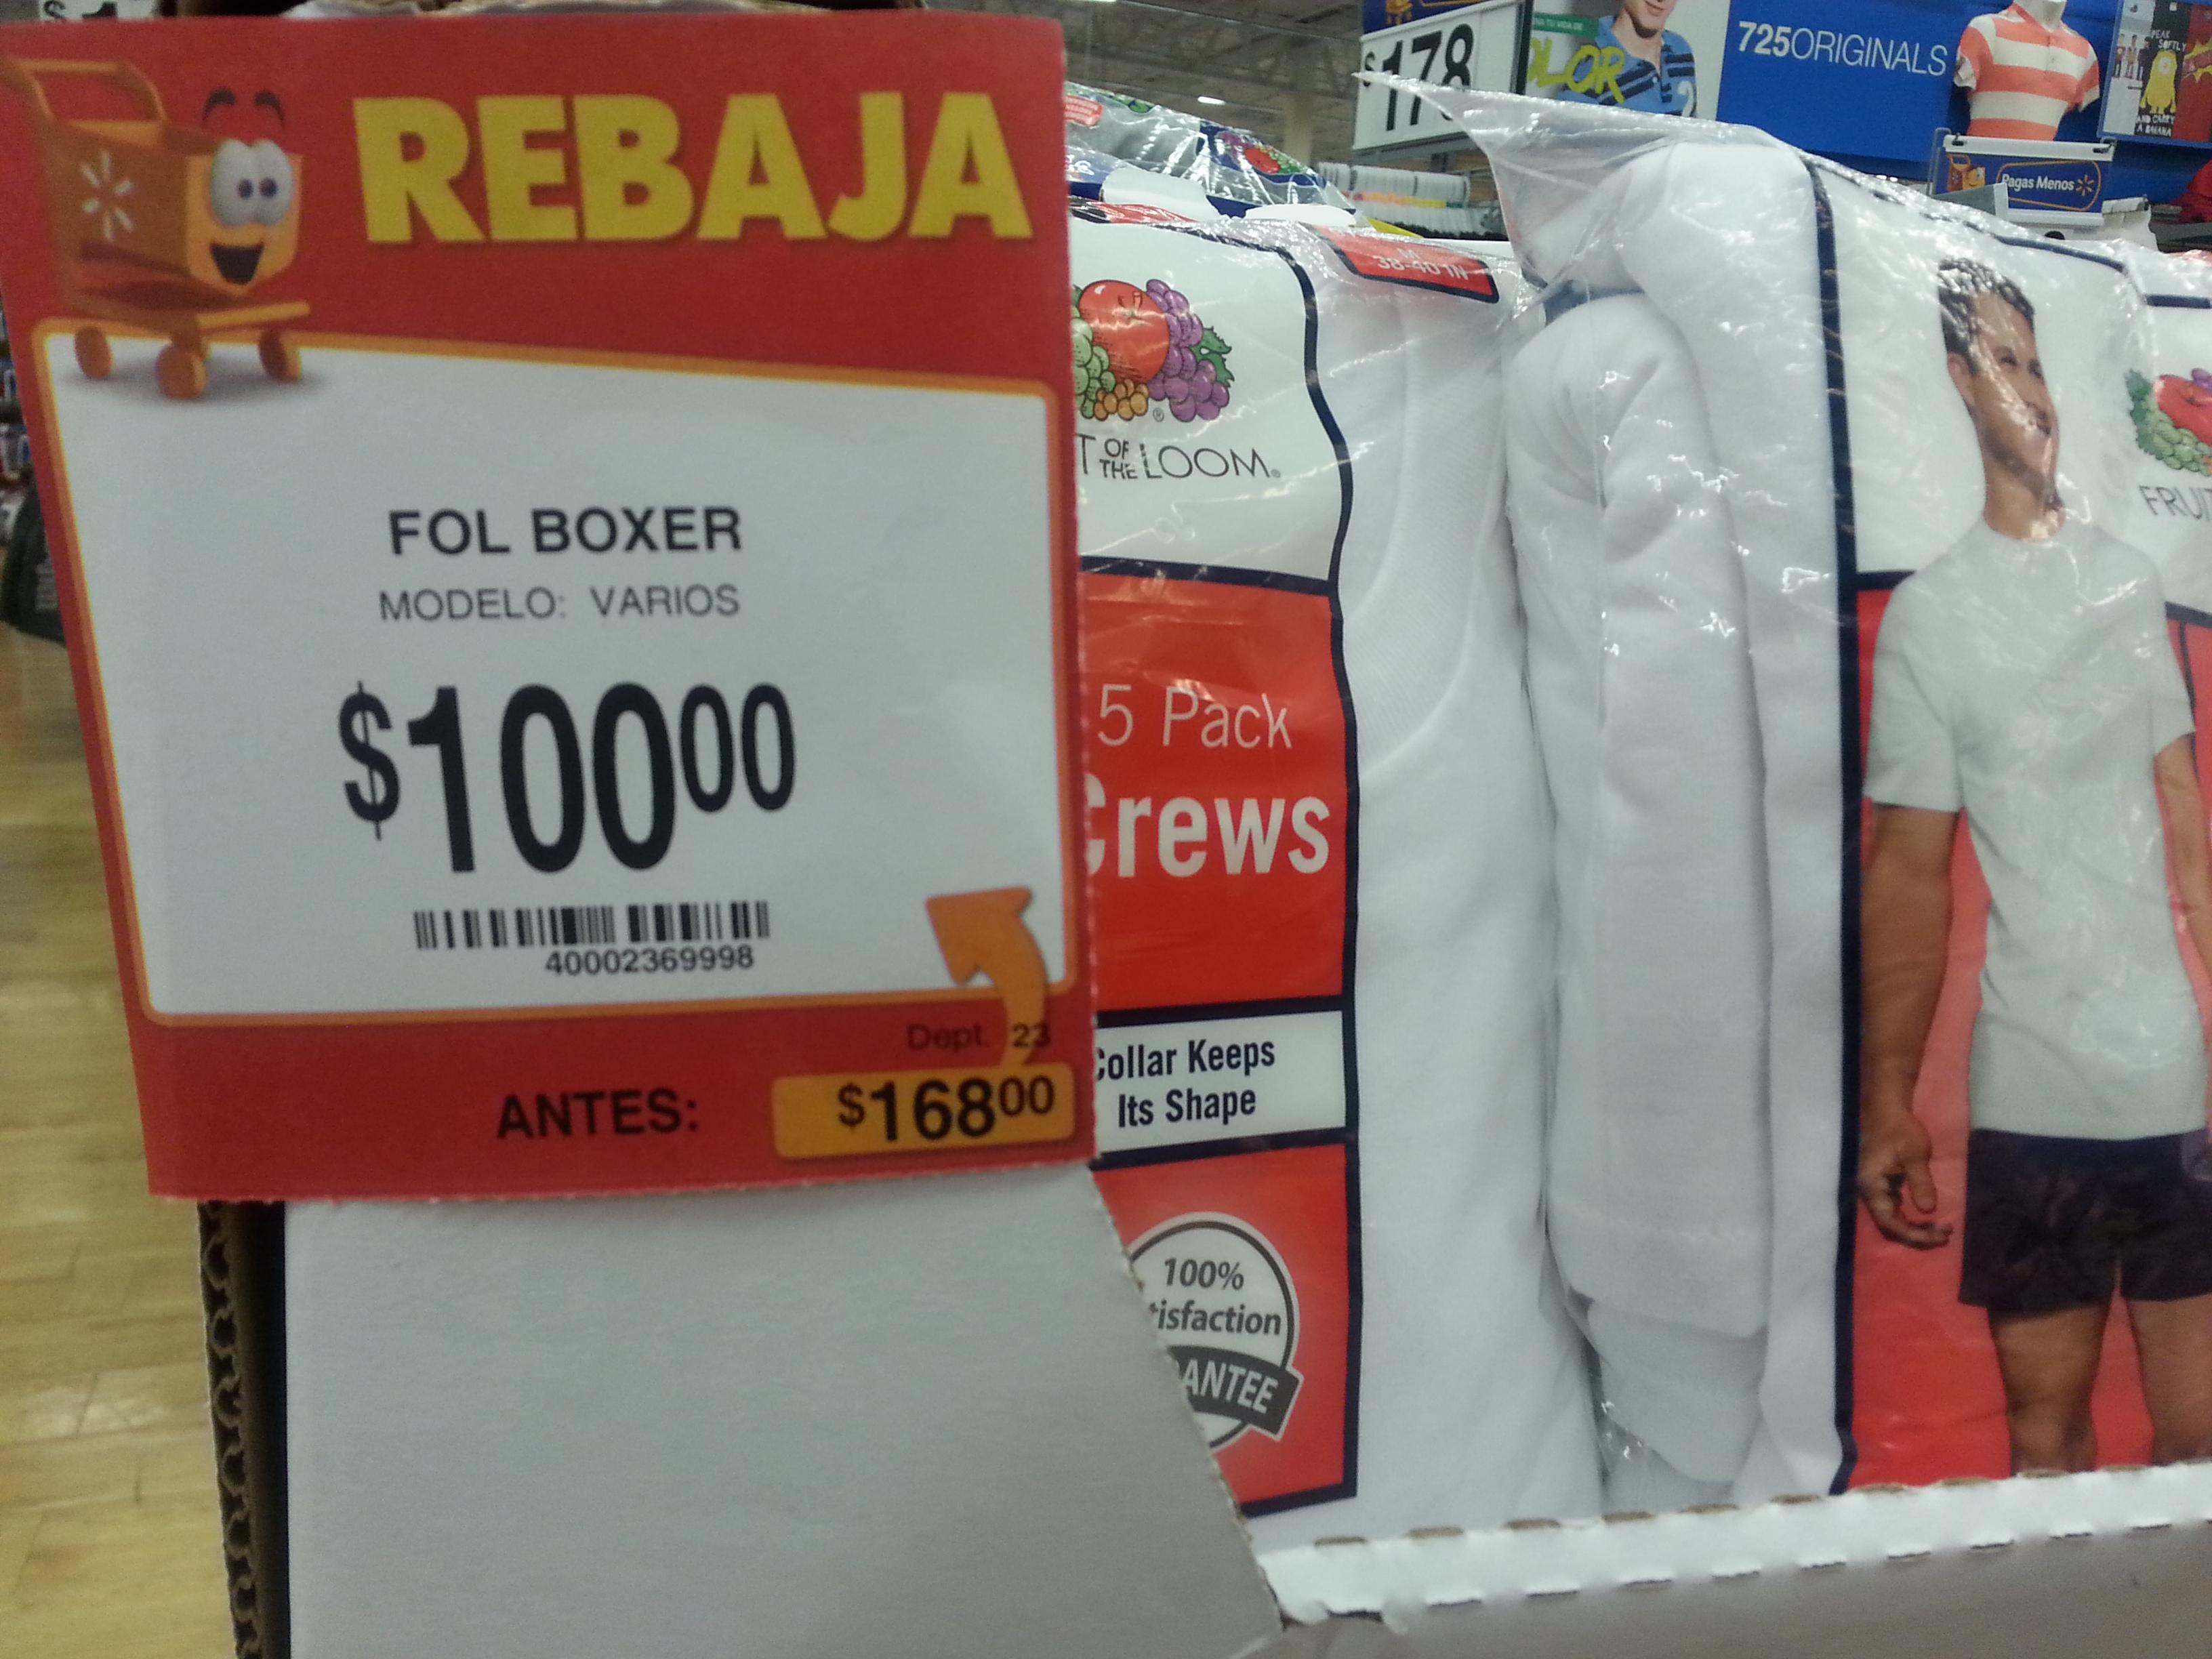 Walmart: paquete de 5 bóxers a $100